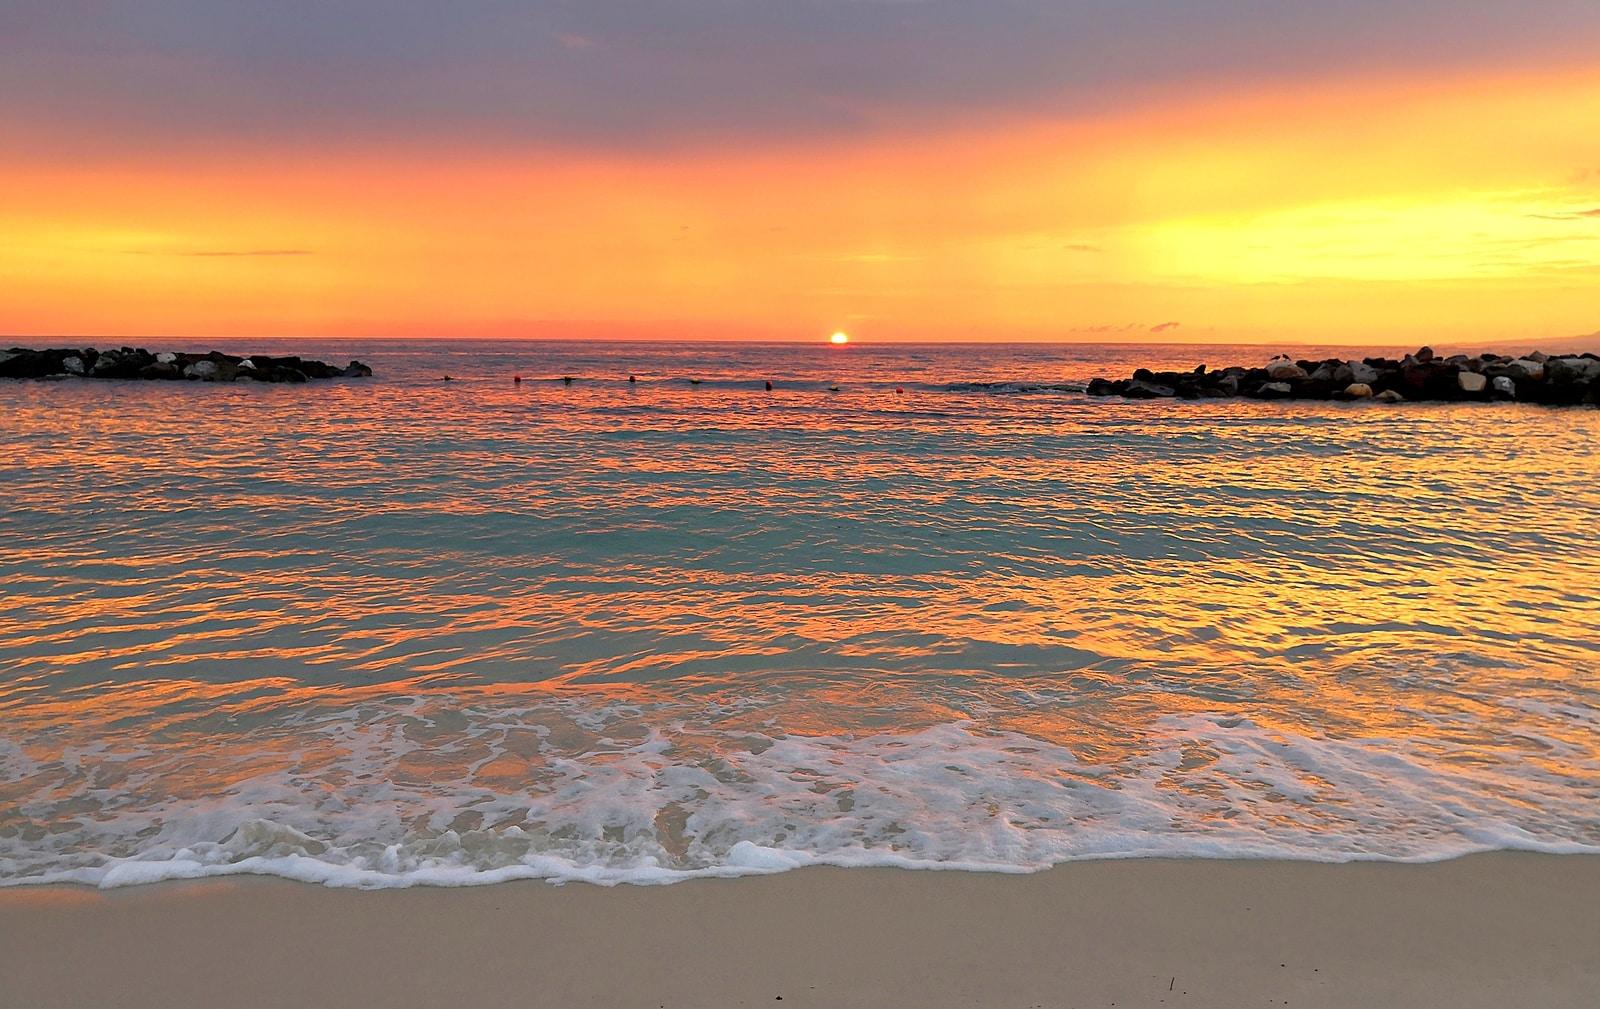 beach Garza Blanca, city of Puerto Vallarta